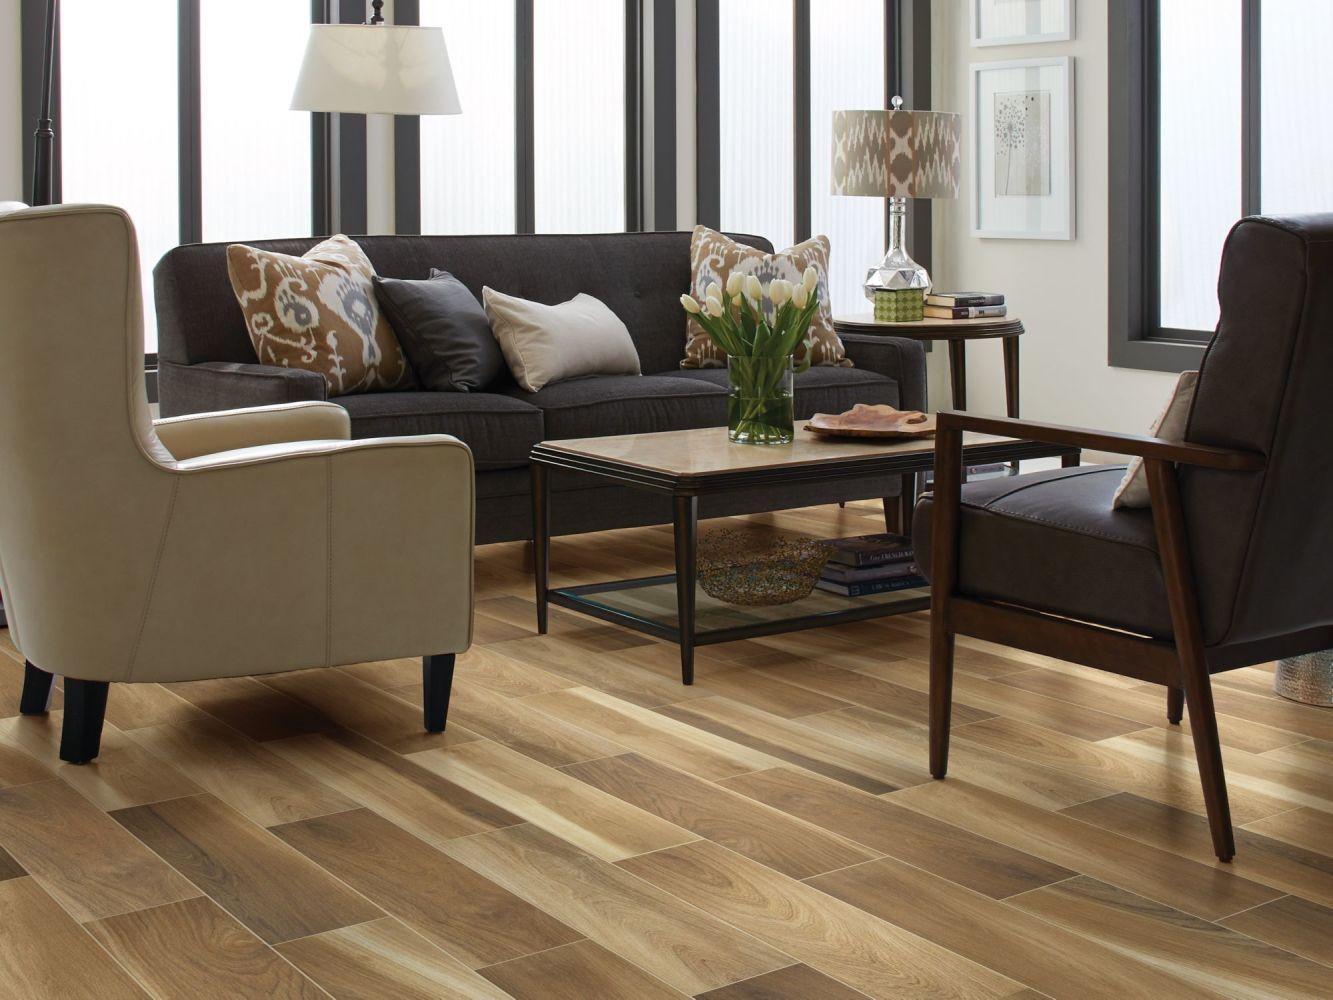 Shaw Floors Home Fn Gold Ceramic Revolution 6×36 Natural 00200_TGN66